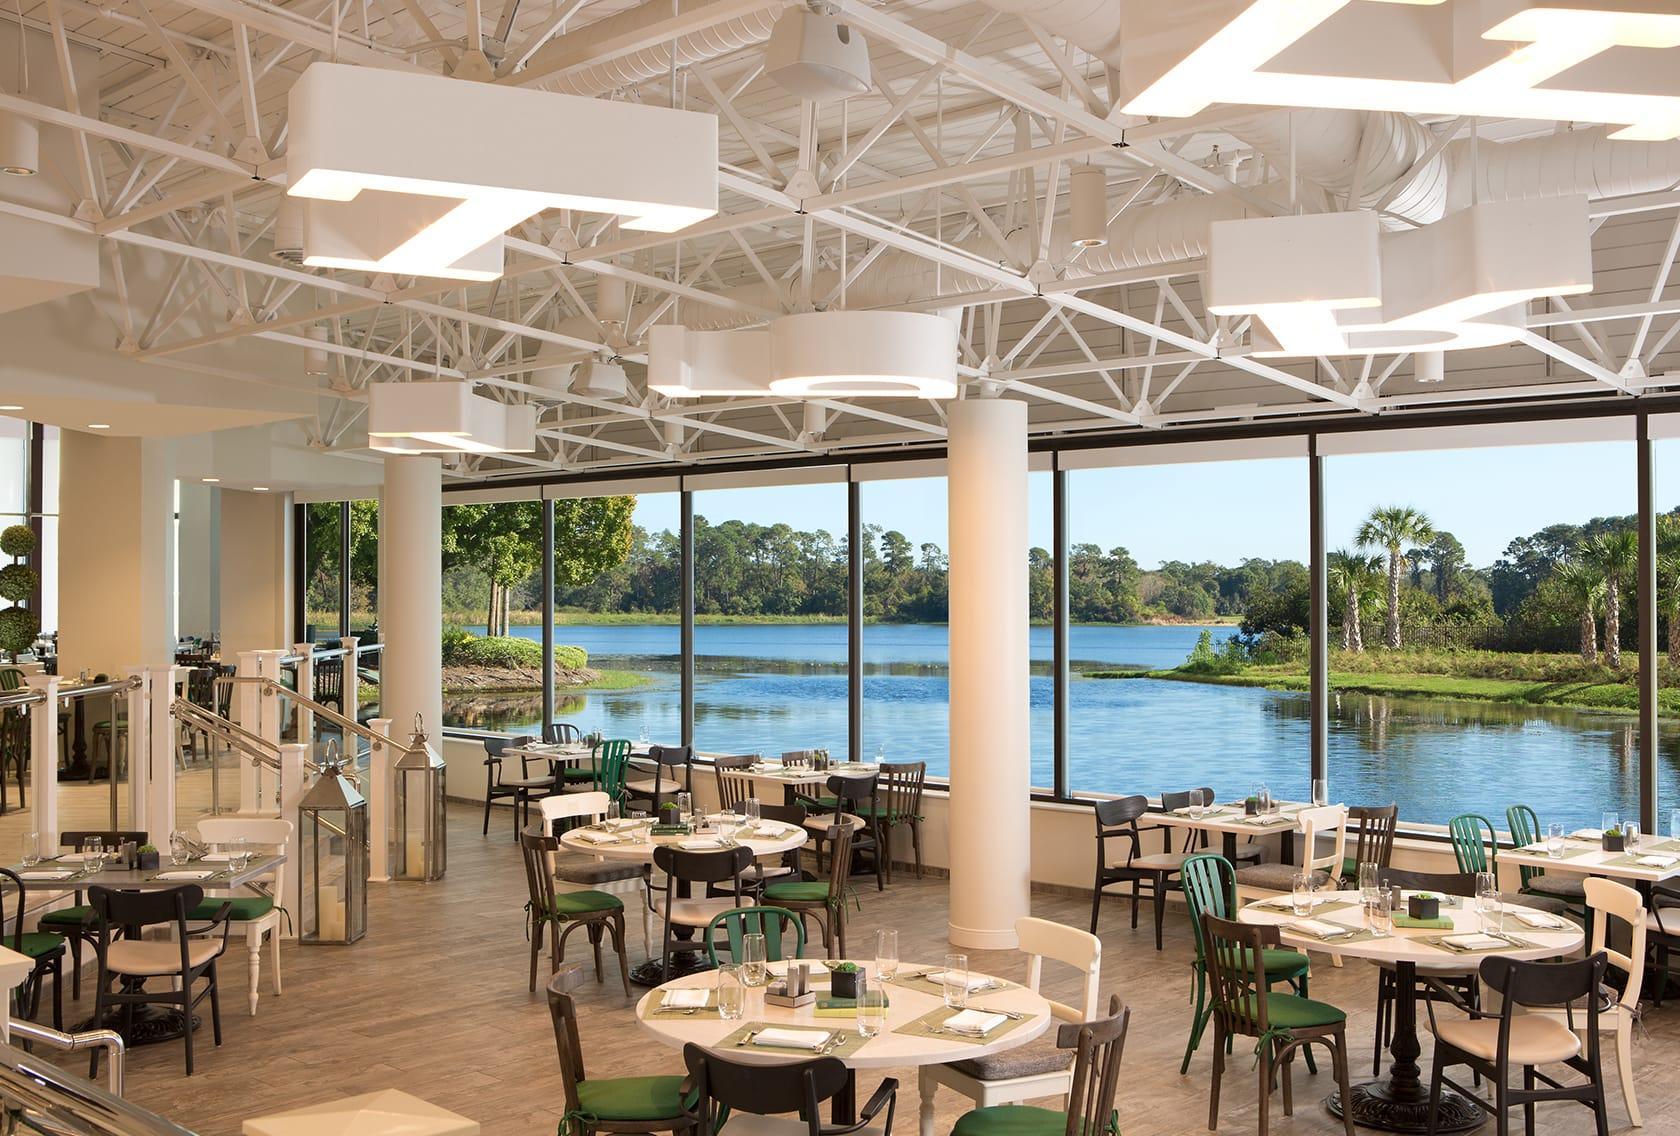 Dining gallery hilton orlando buena vista palace hotel for Restaurant vista palace